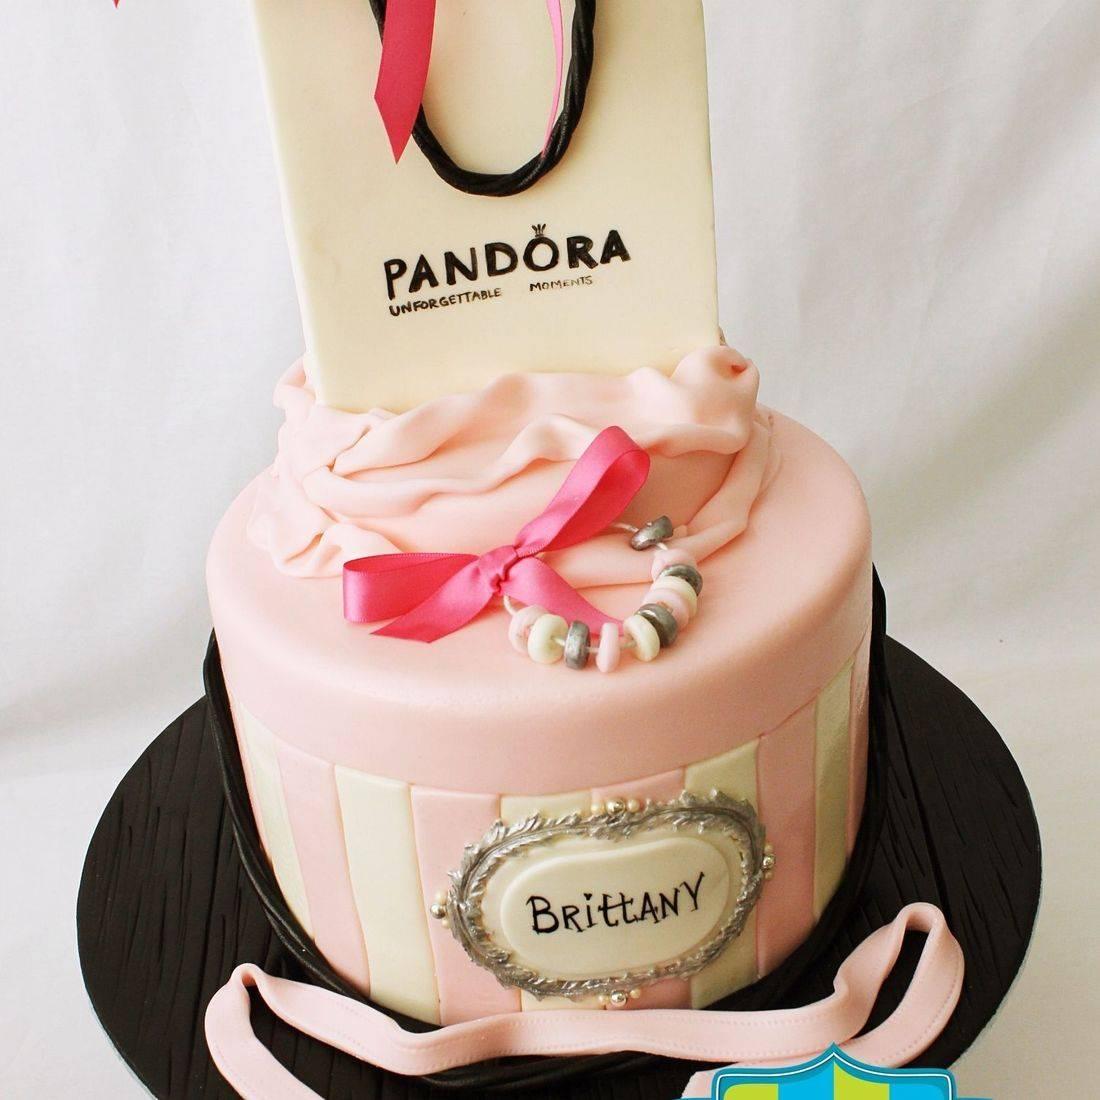 Pandora Fashion Cake Milwaukee